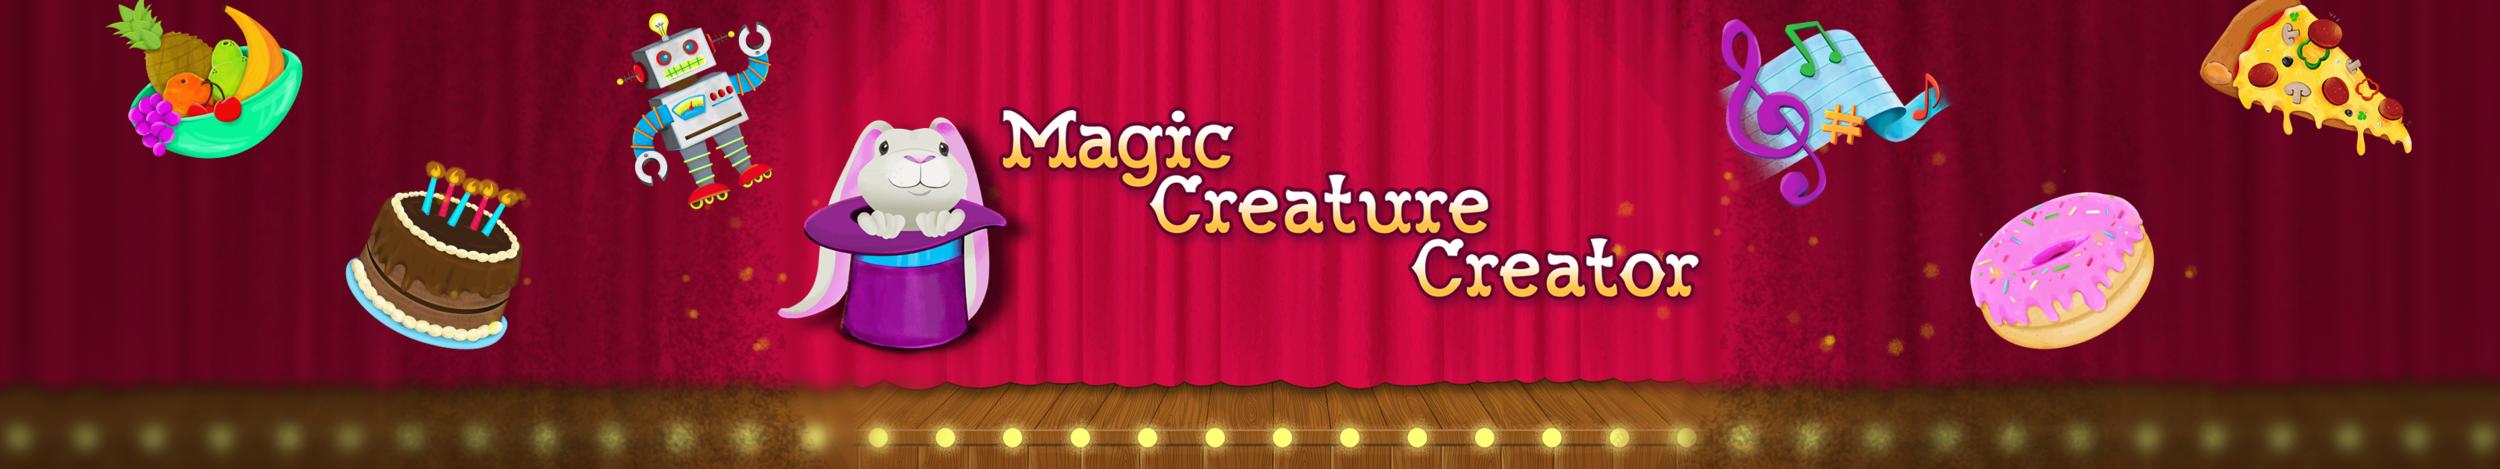 MagicHat_banner.jpg